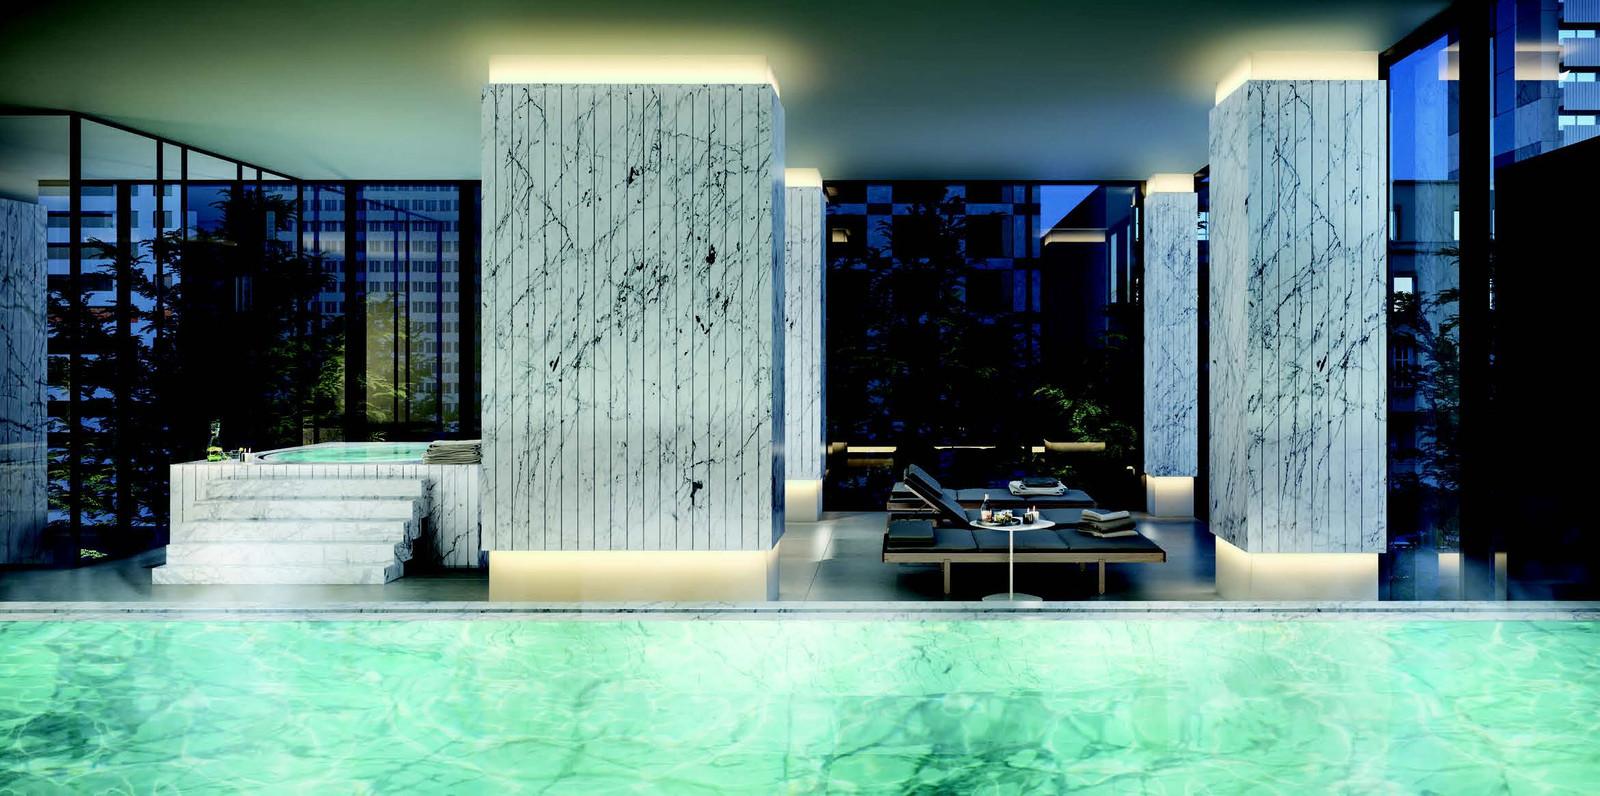 CBD   303 La Trobe Street   43L   ~150m   Residential